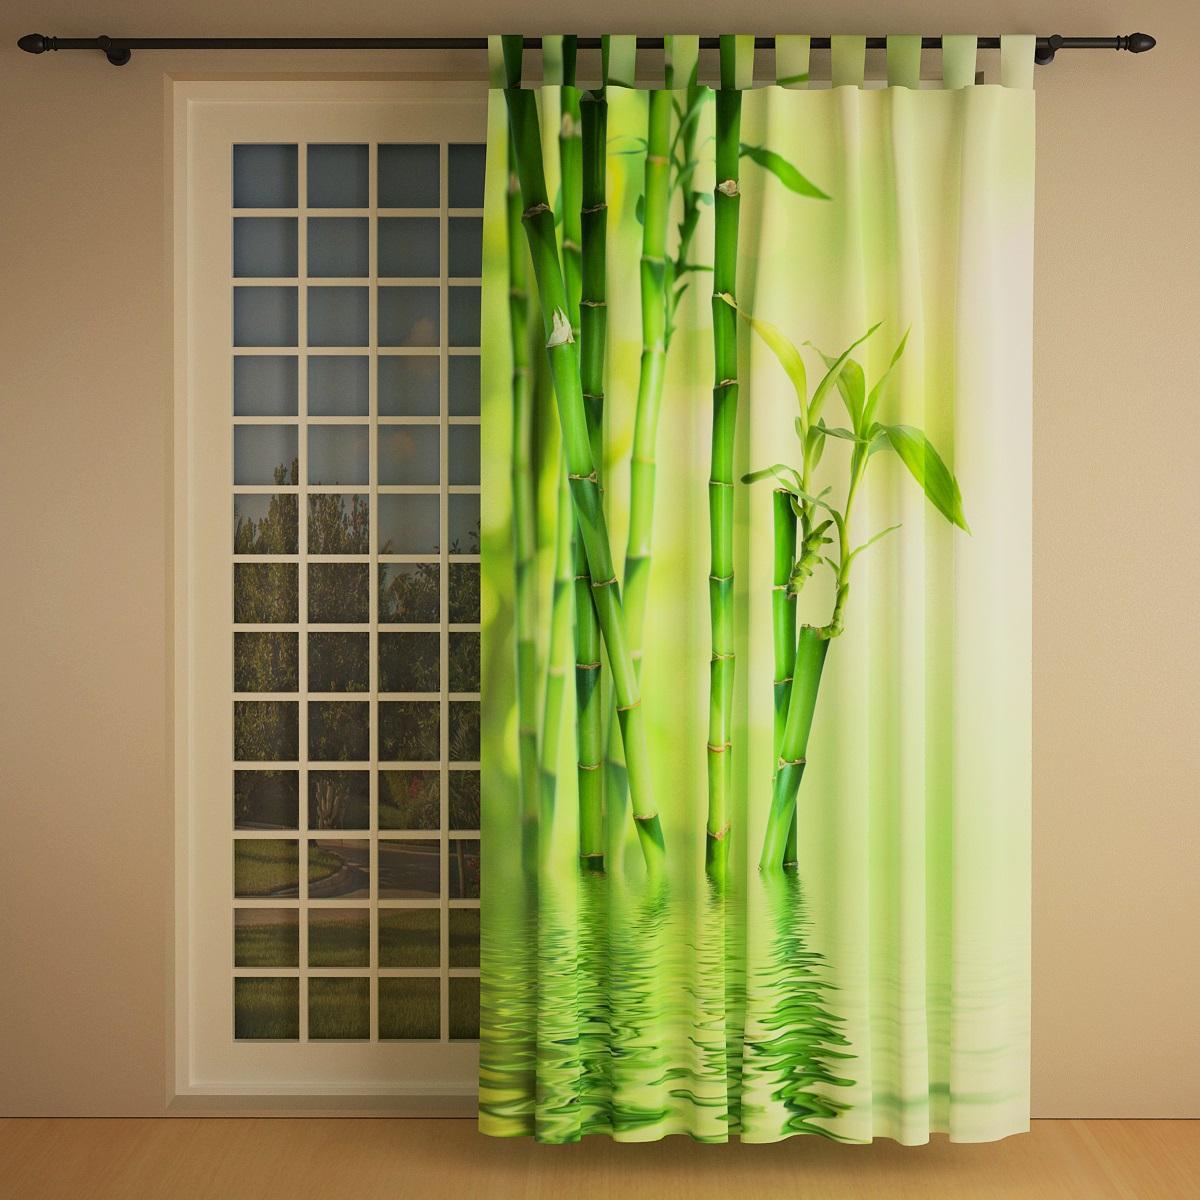 vorhang bambus 145 x 245cm links blickdicht lichtdurchl ssig bambusvorhang ebay. Black Bedroom Furniture Sets. Home Design Ideas